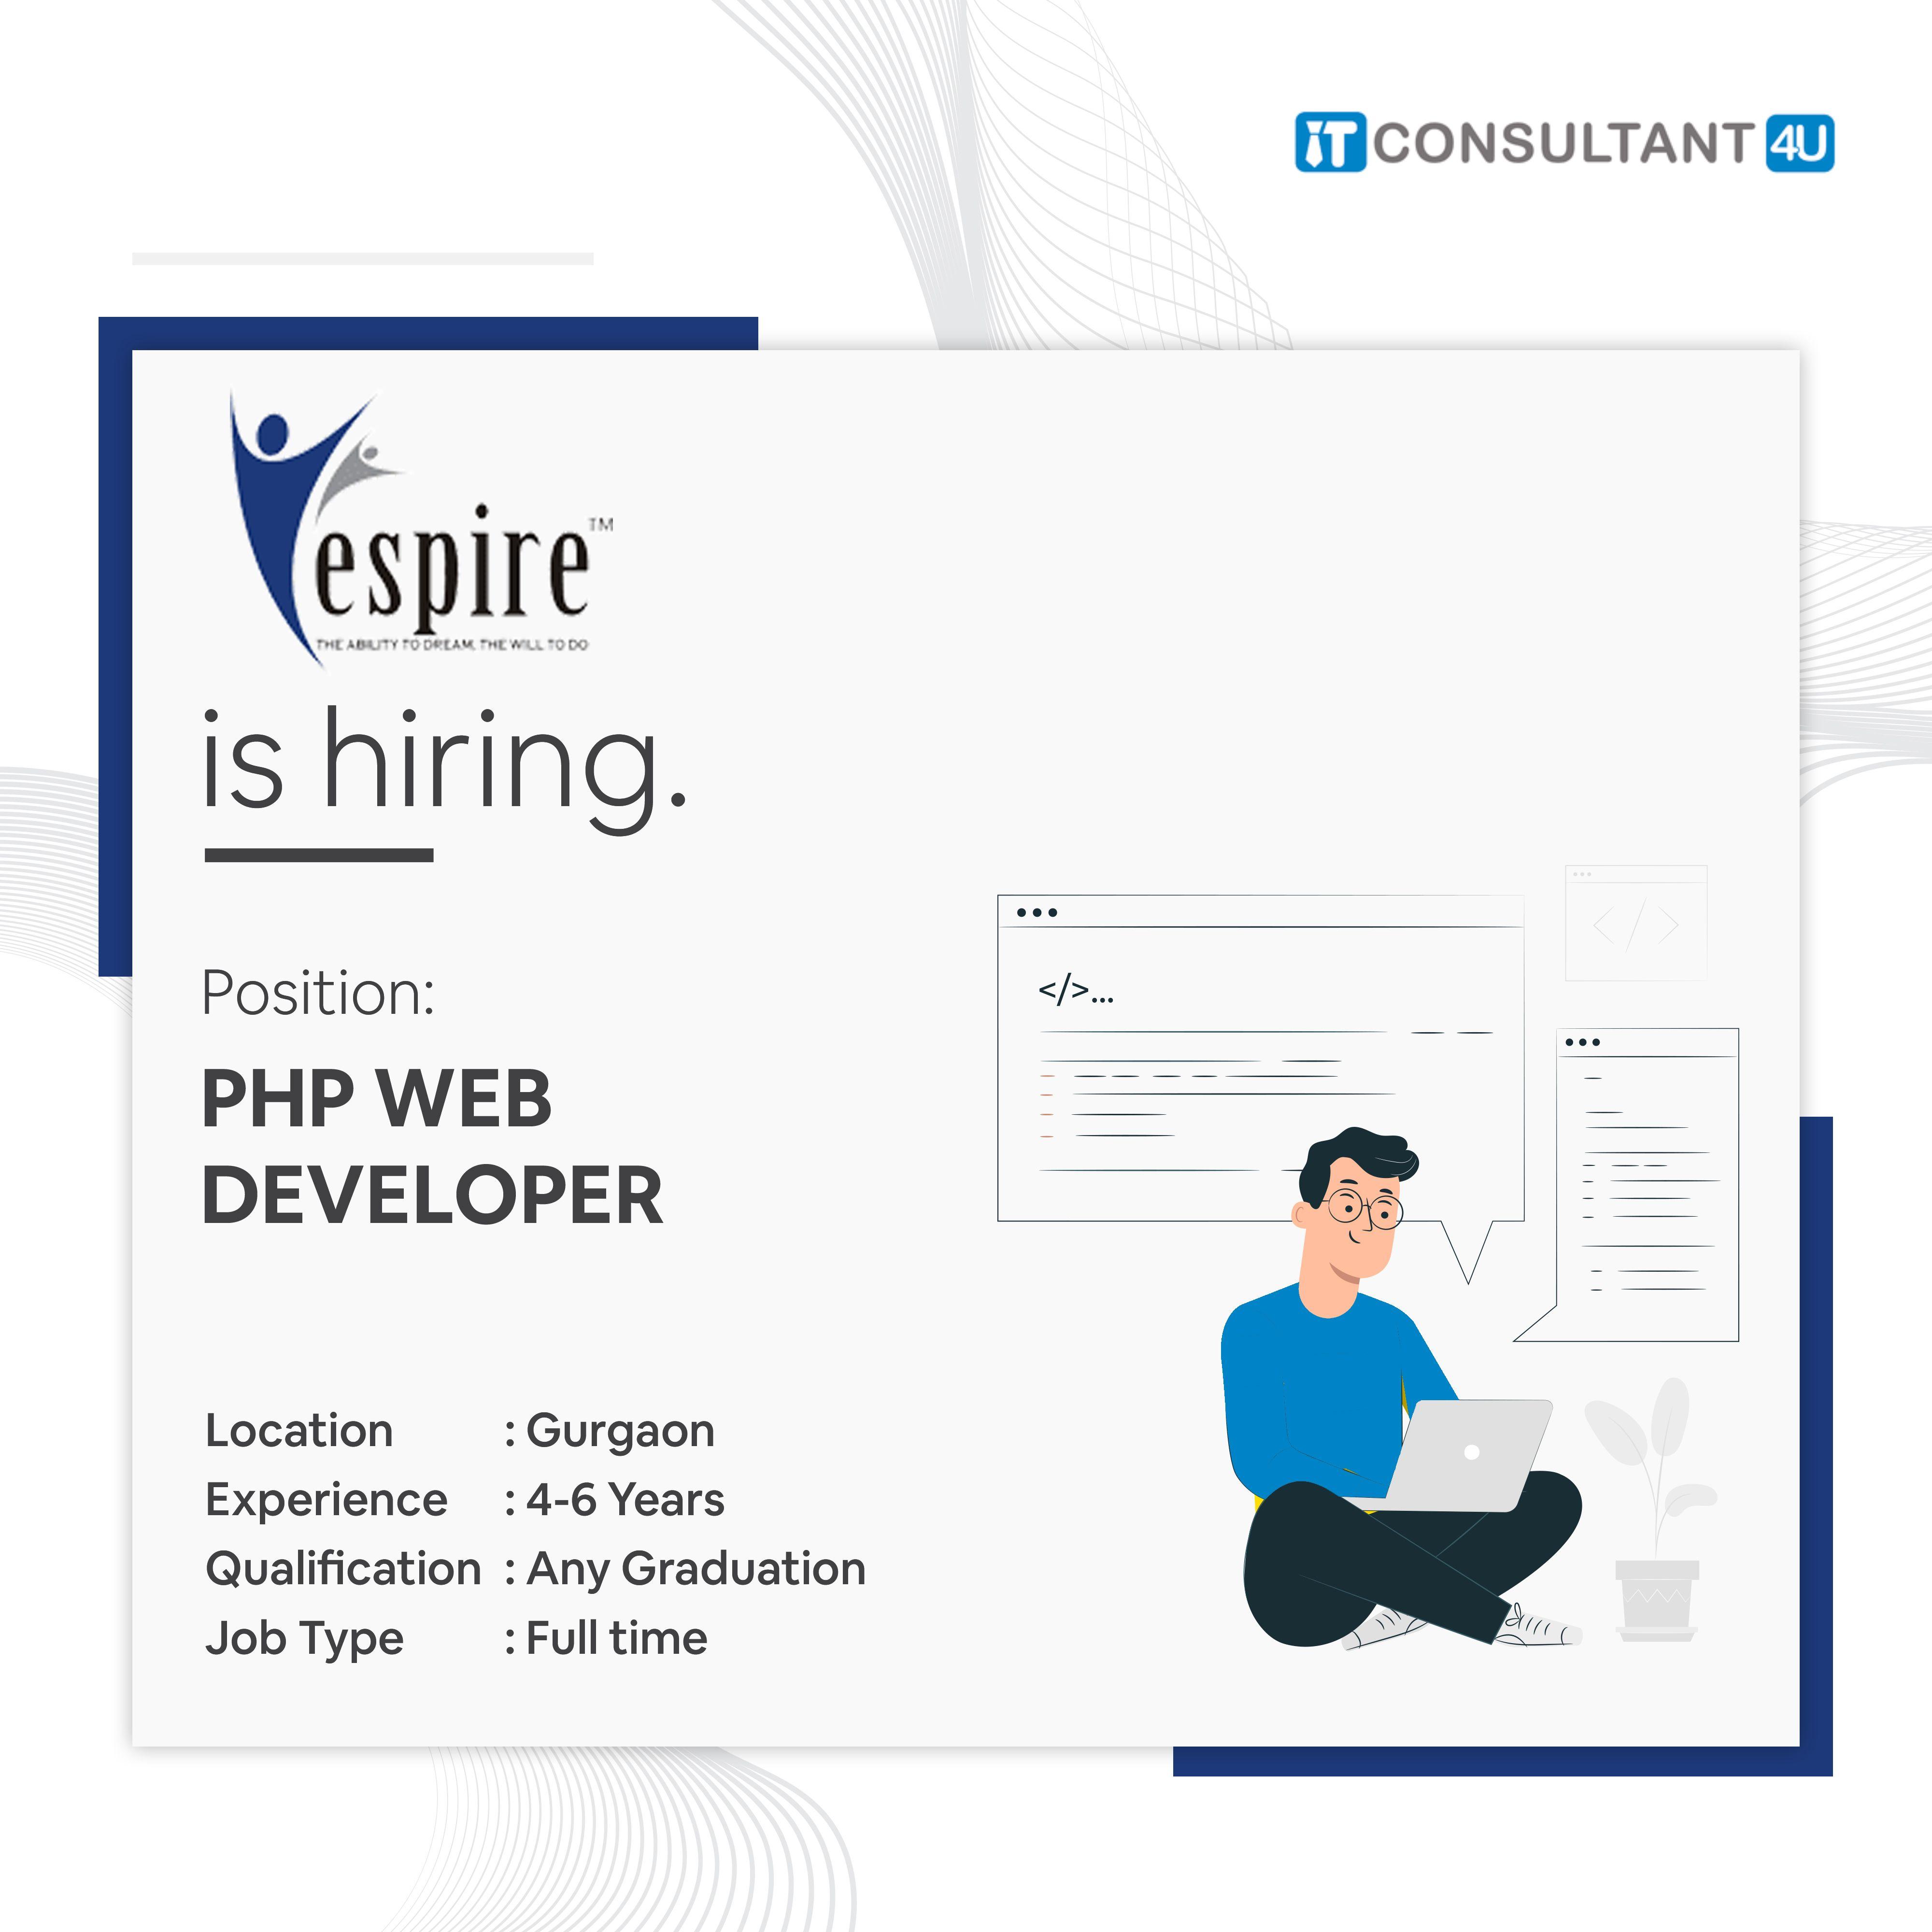 Phpwebdeveloper Gurgaonjobs Itjobs Itc4u Itconsultant4u In 2021 Jobs For Freshers Job Full Stack Developer